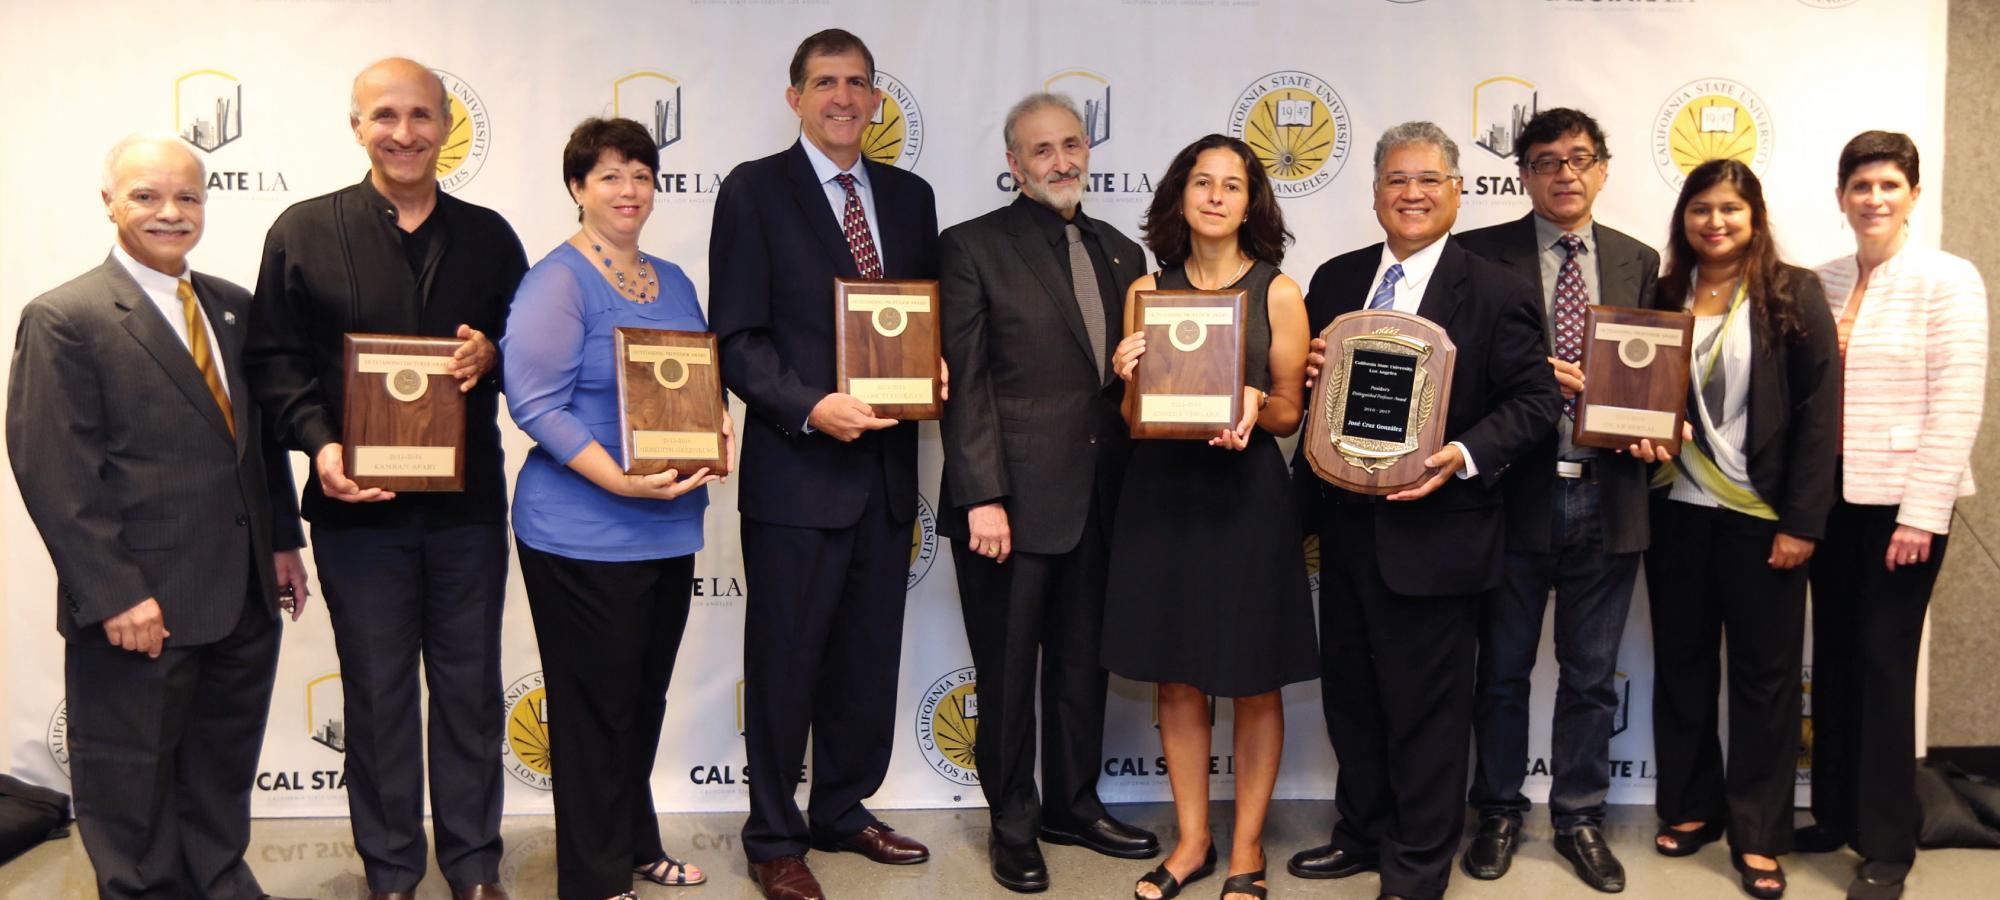 Outstanding Professor Award Honorees